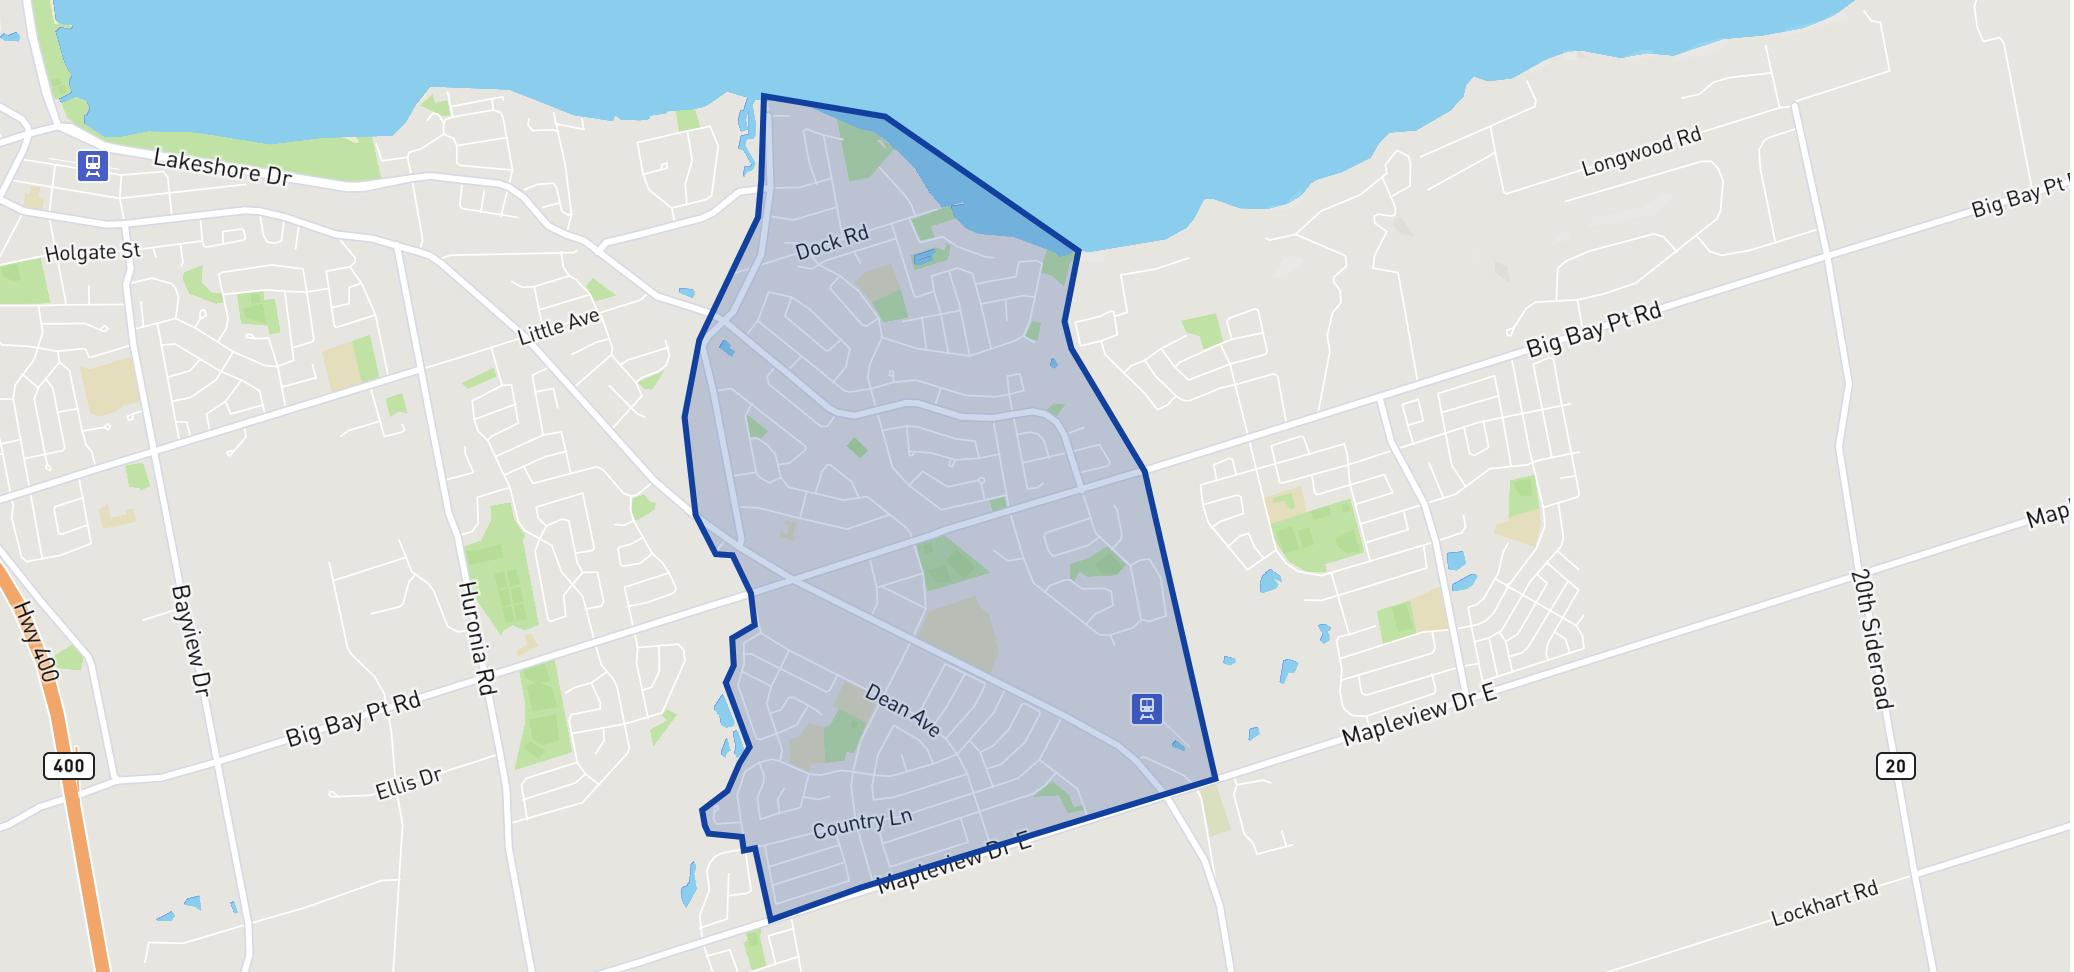 St. John Paul II Separate School neighbourhood borders